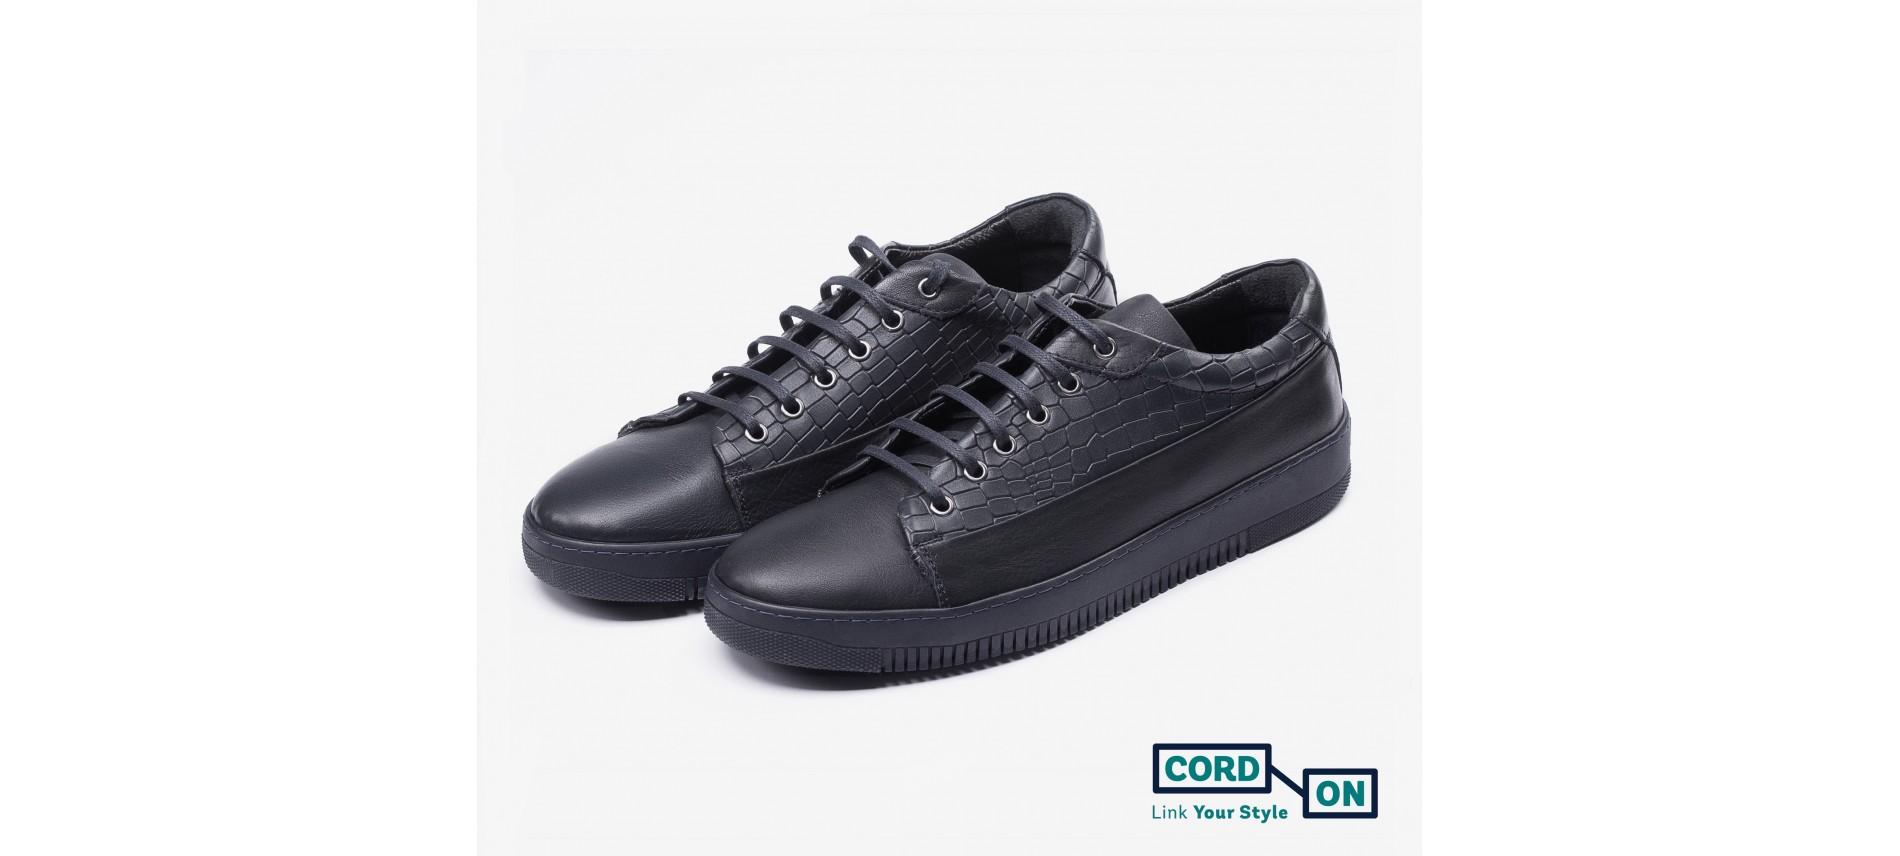 Cordones lustrados planos para calzado